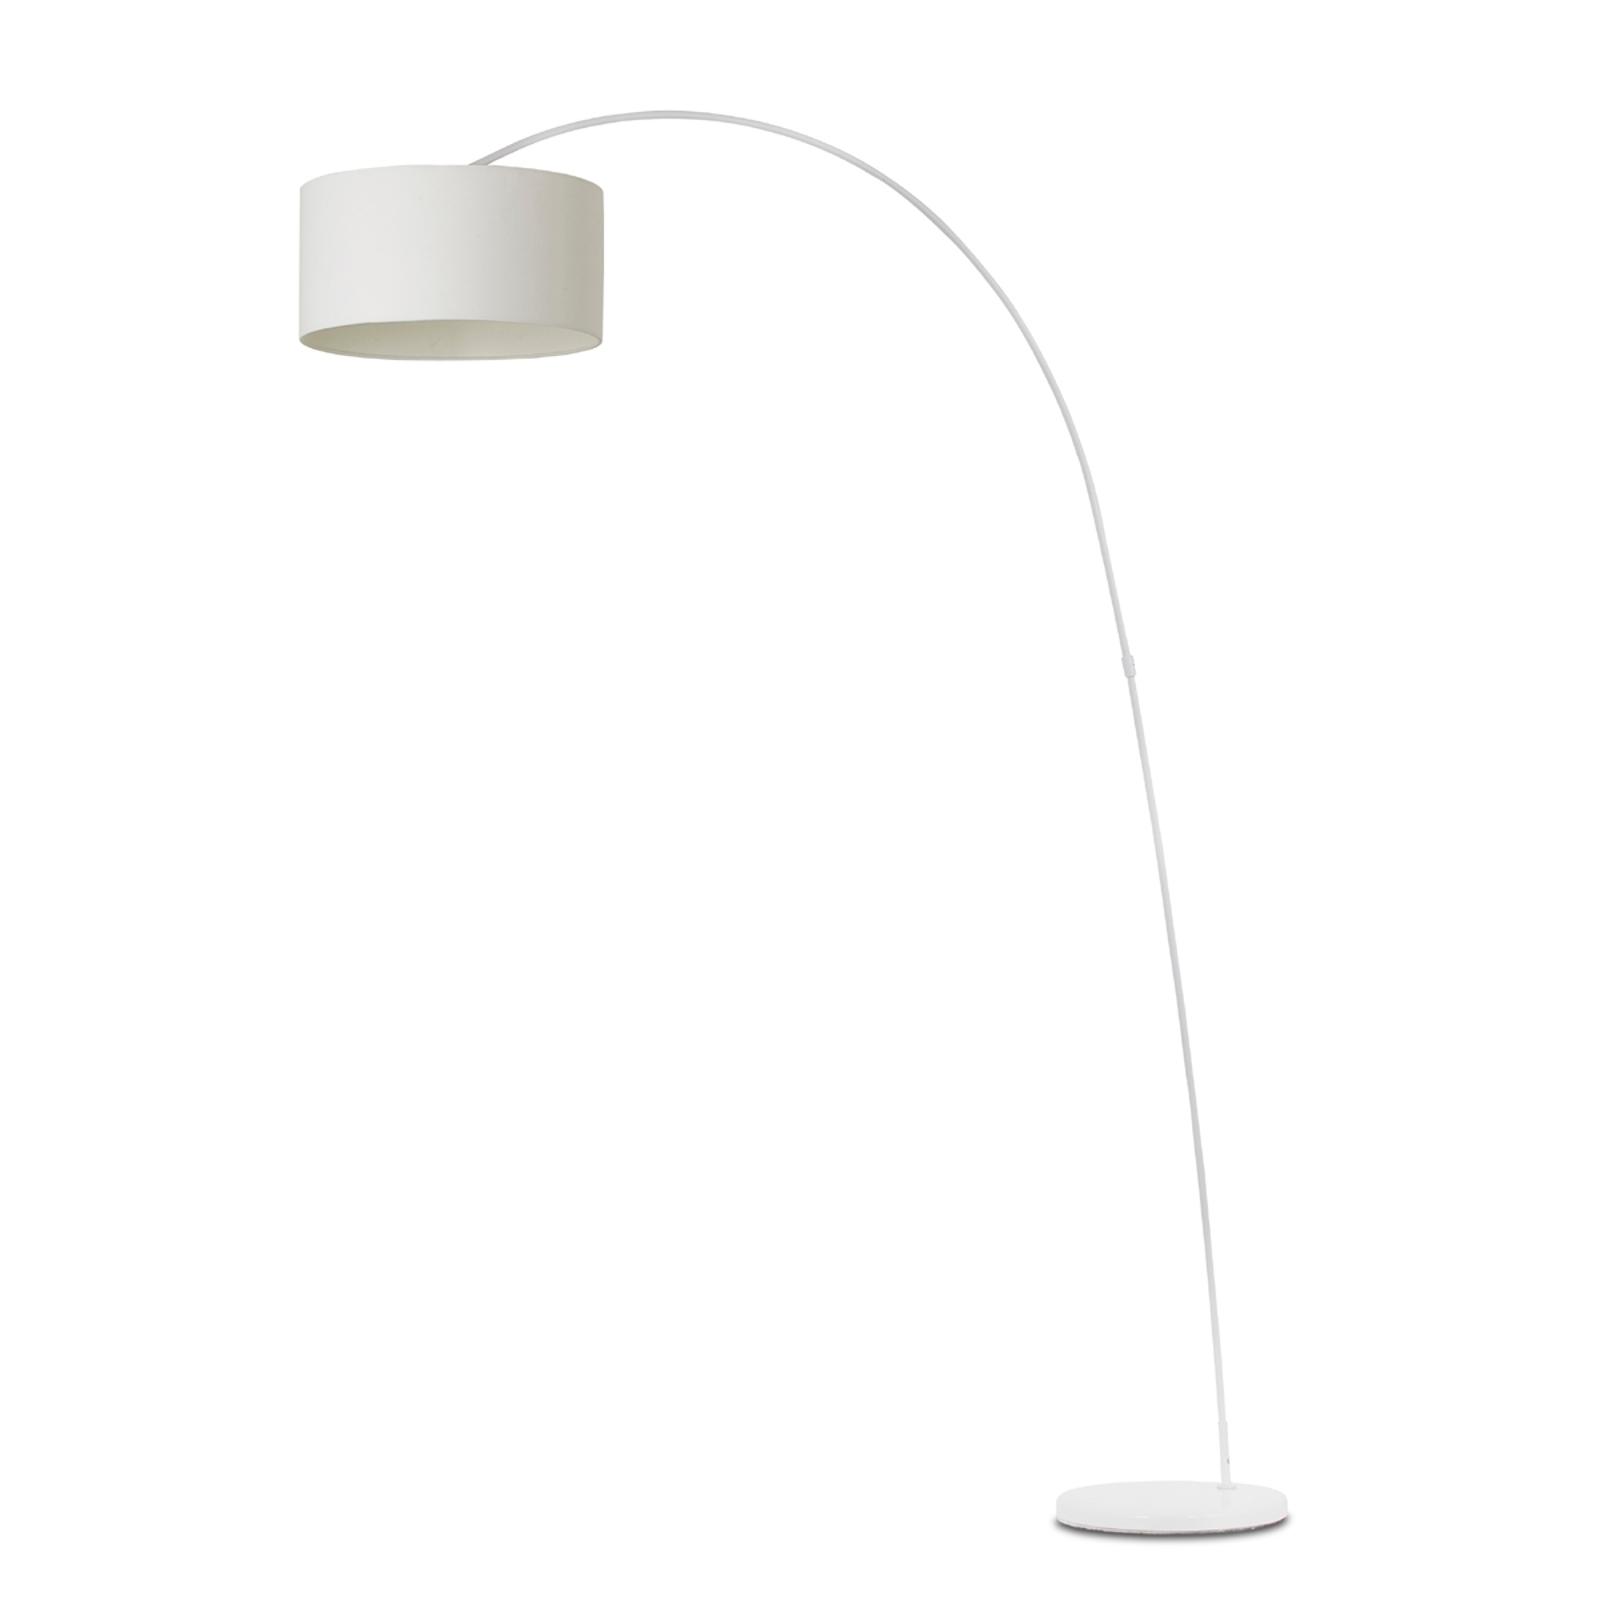 Decoratieve booglamp PAPUA, wit